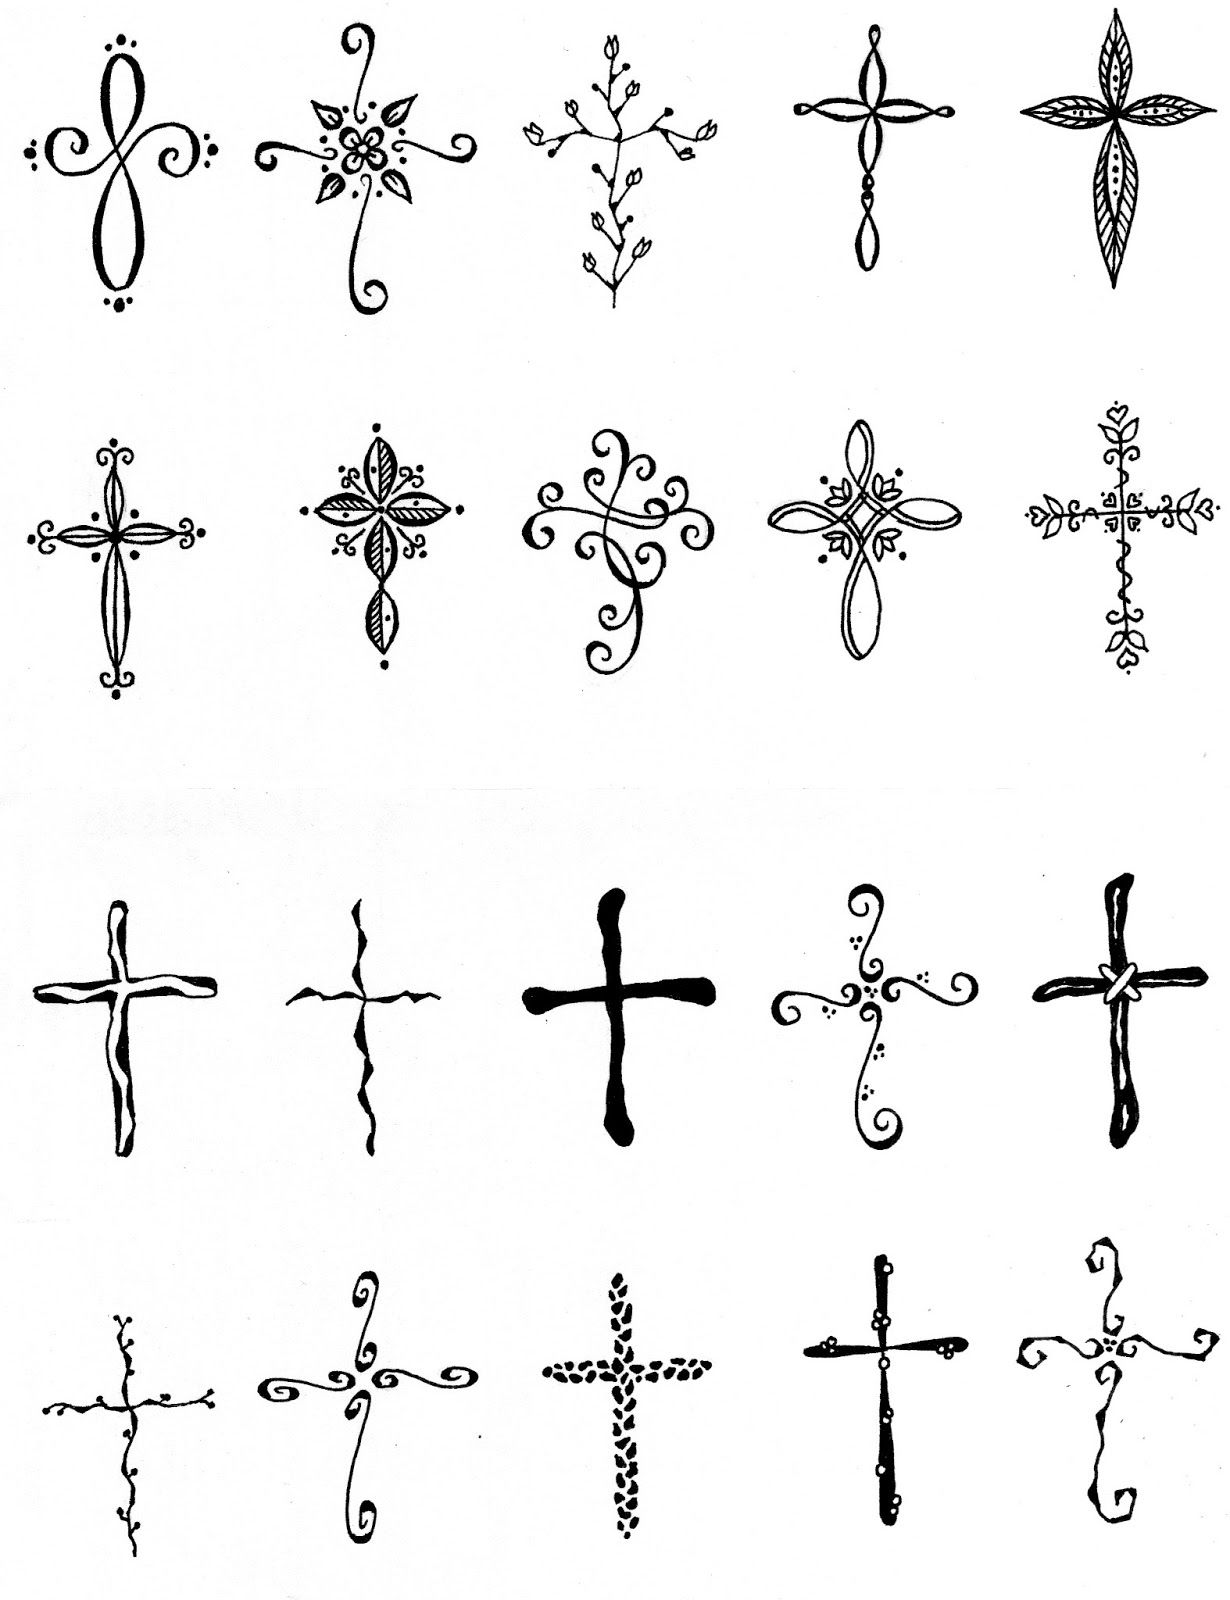 smallcross tattoo | Small Cross Tattooscross Tattoos Tattoobite Uttdzqzo